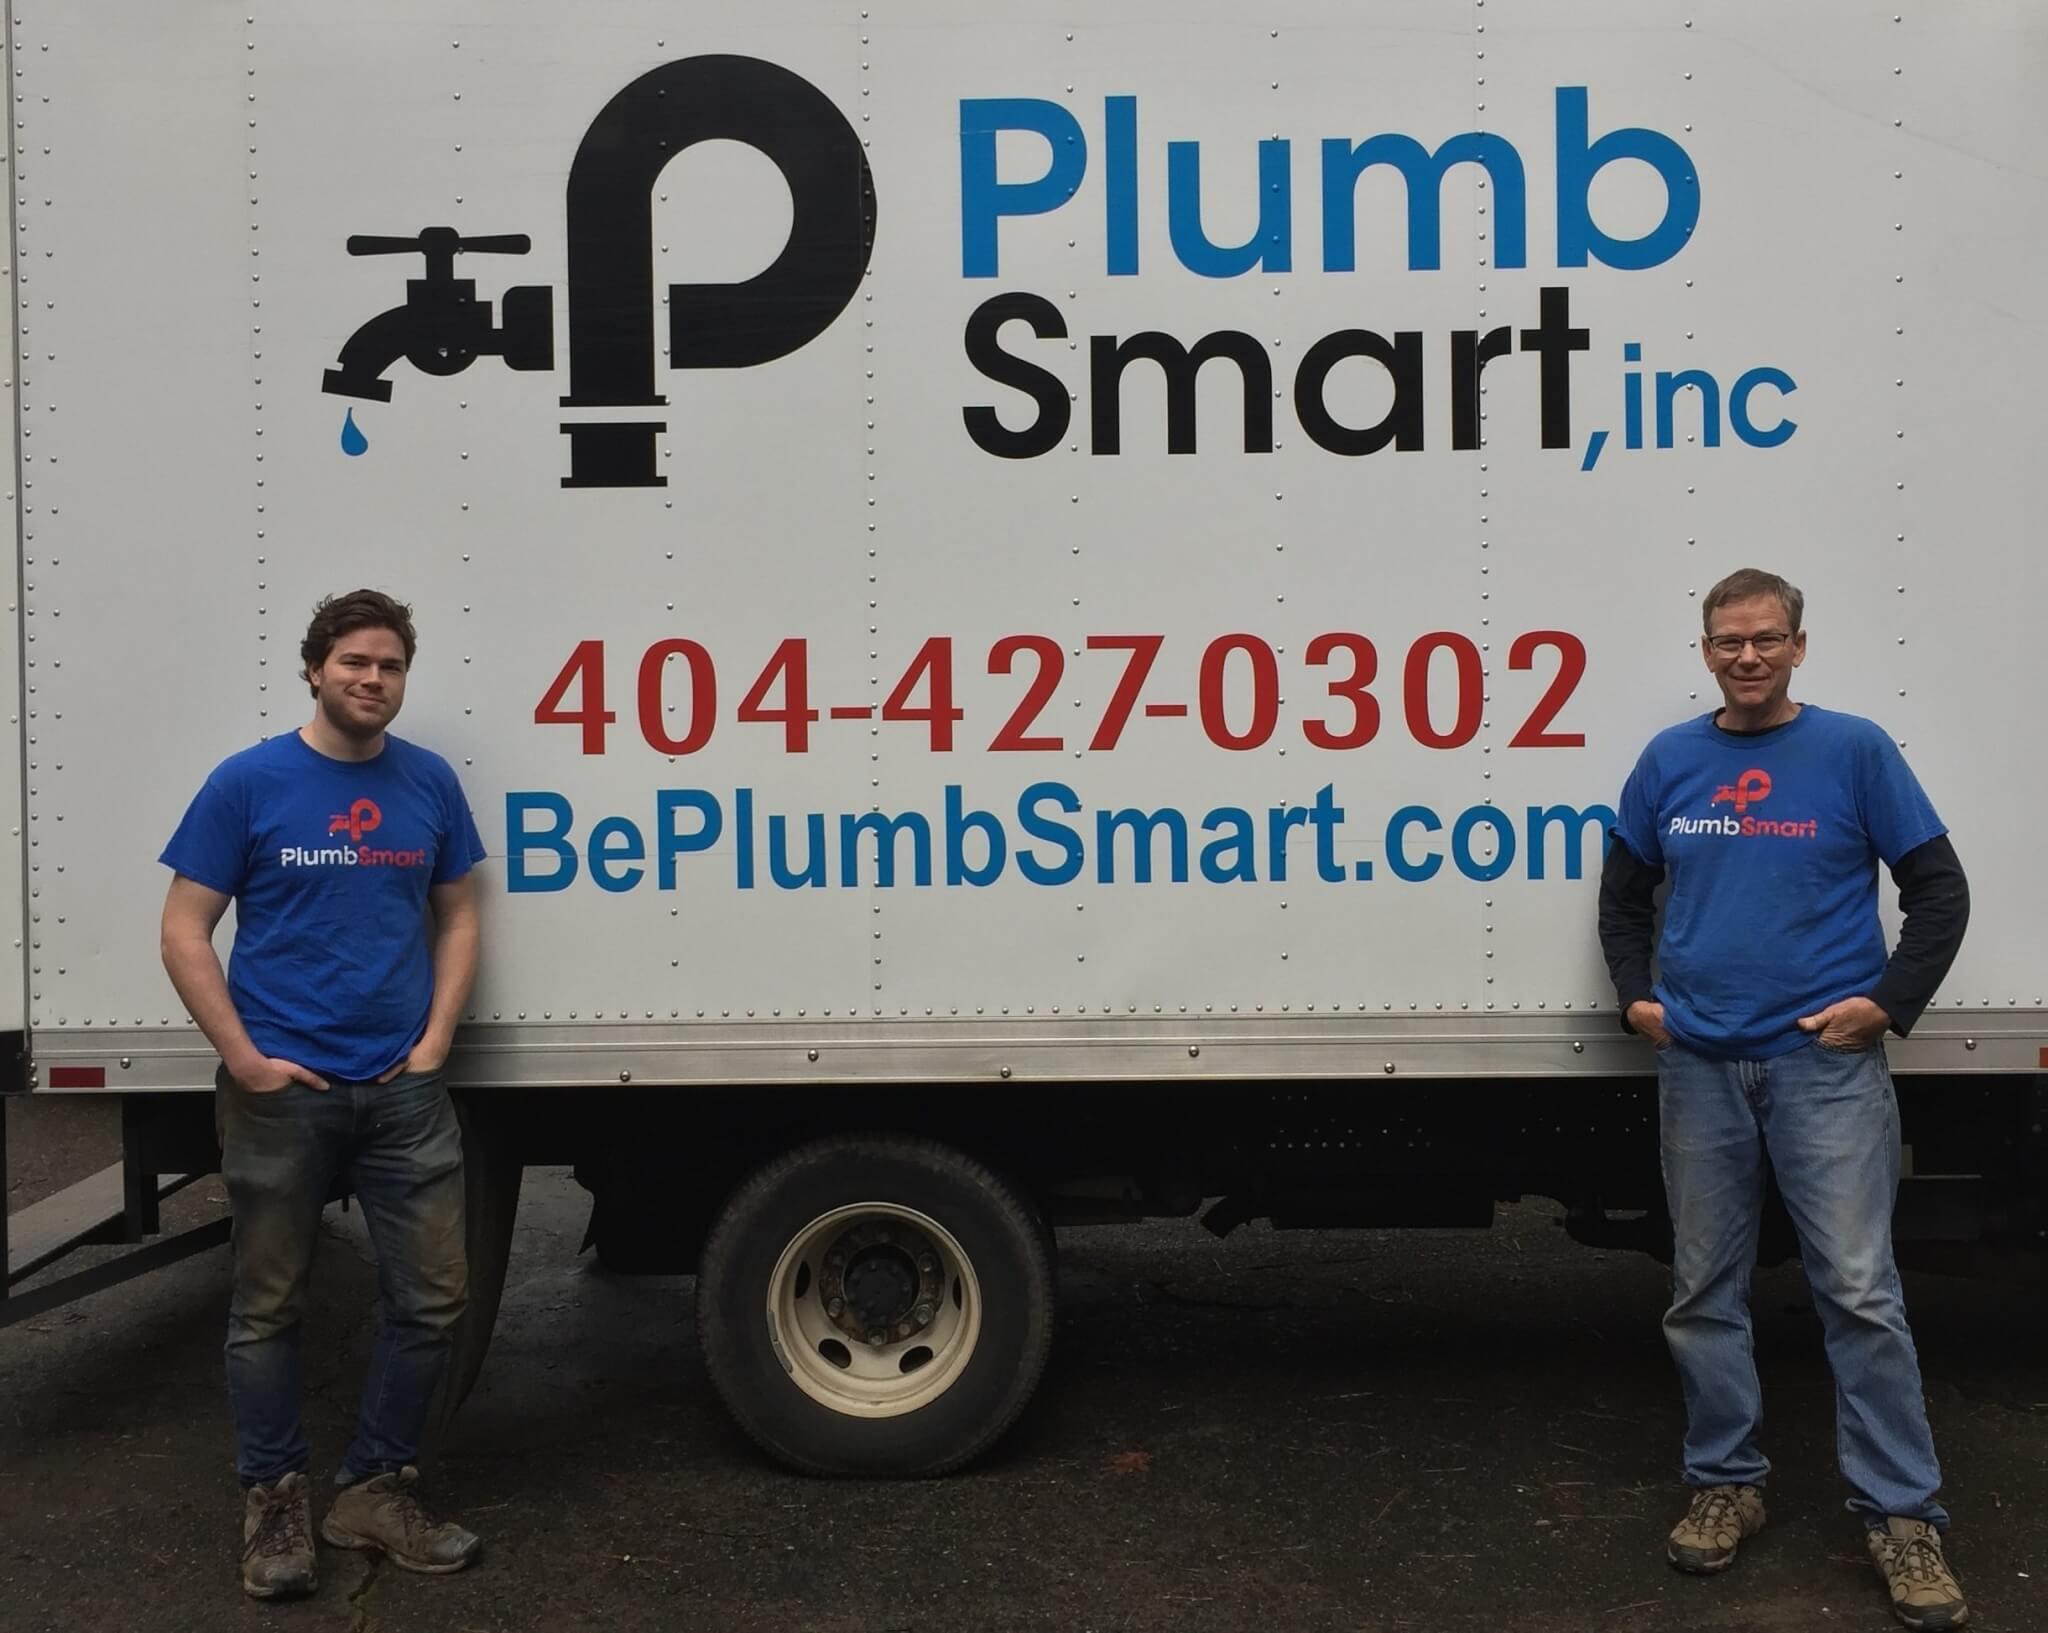 Plumb Smart Plumbers